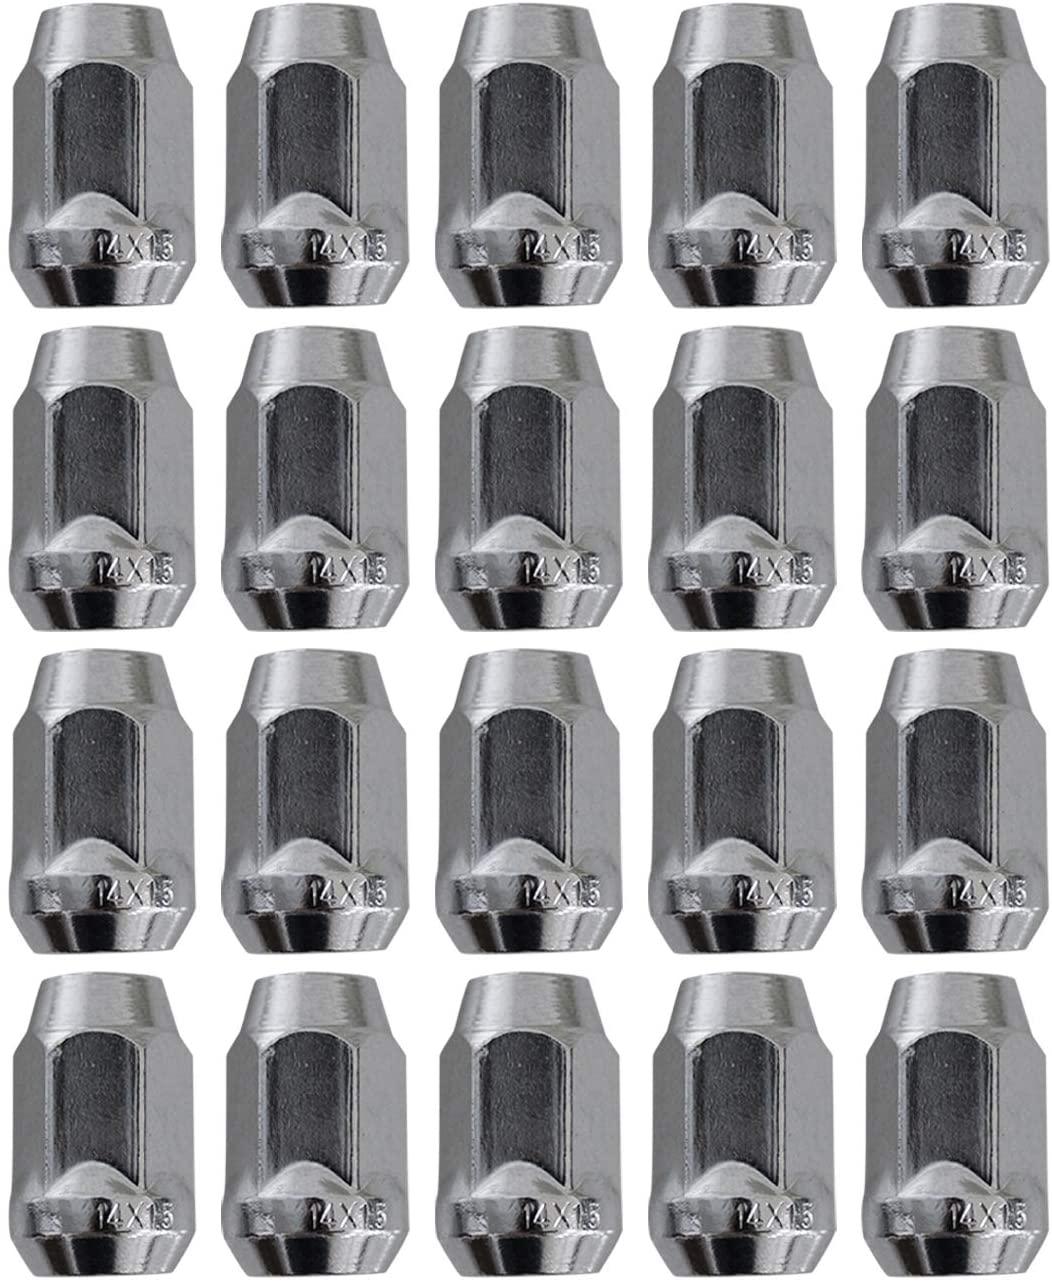 Beneges 20 Pcs M14x1.50 Wheel Lug Nuts 13/16 (21mm) Hex Chrome Bulge Acorn Lug Nuts